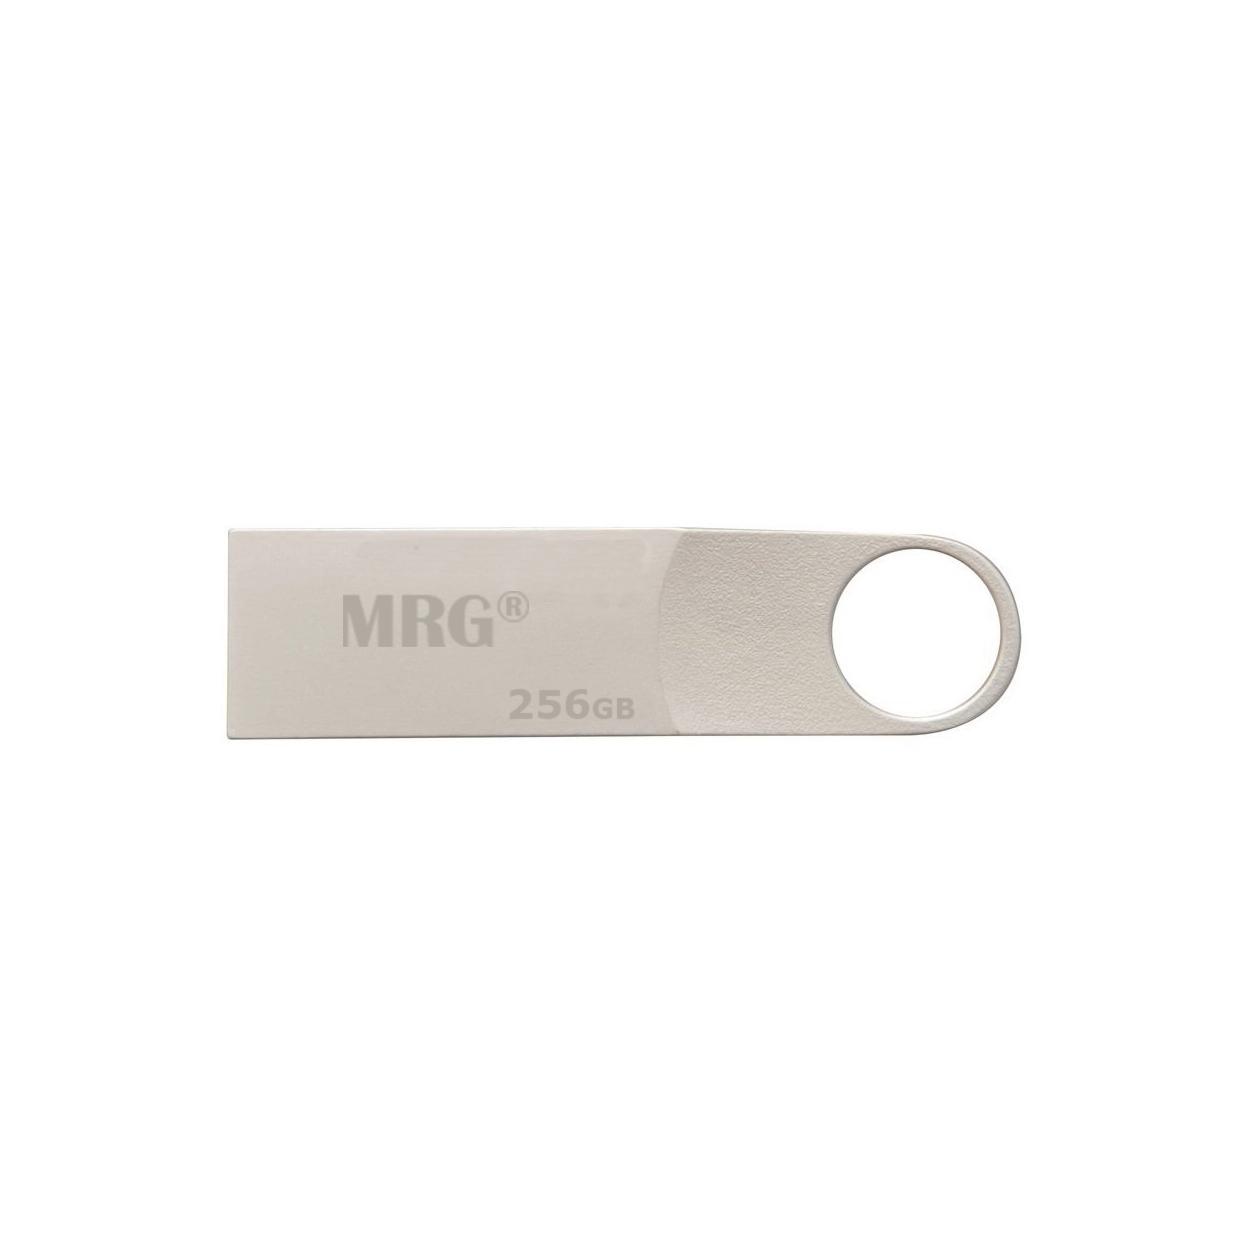 Memorie USB MRG M-SE9, USB 2.0, 256 GB, Gri